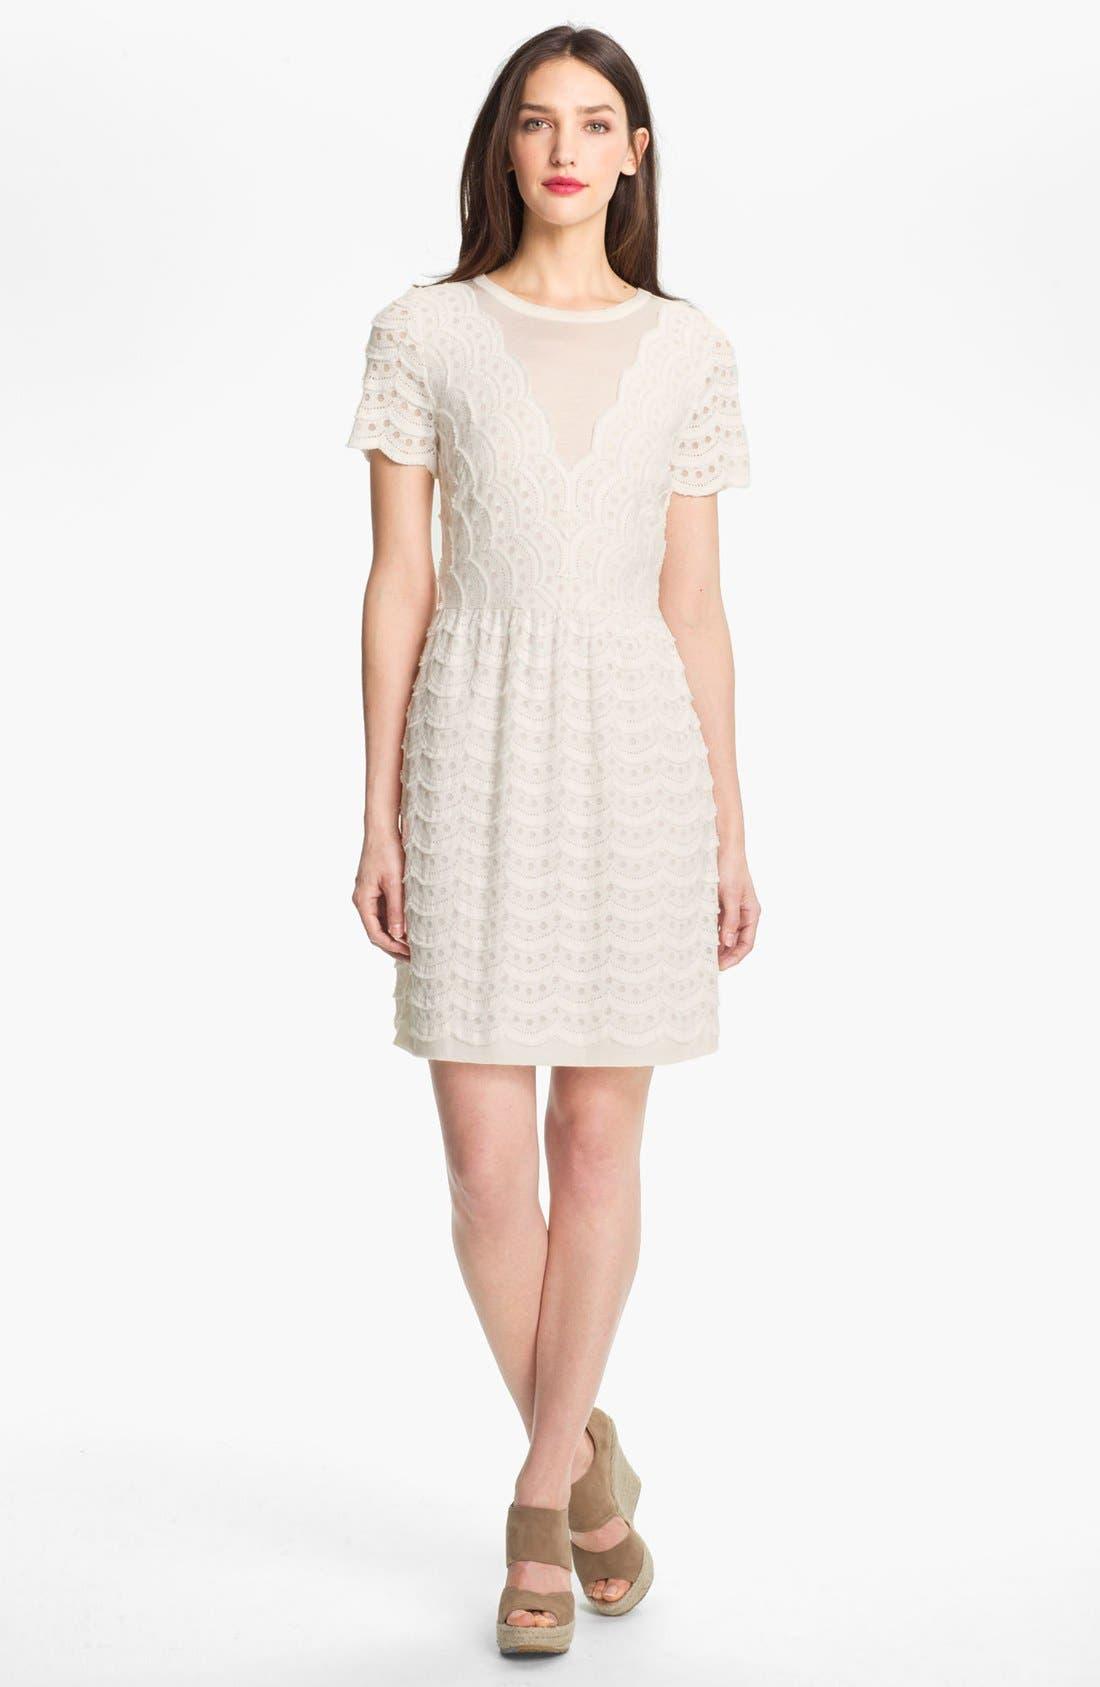 Main Image - MARC BY MARC JACOBS Knit Cotton Blend Dress